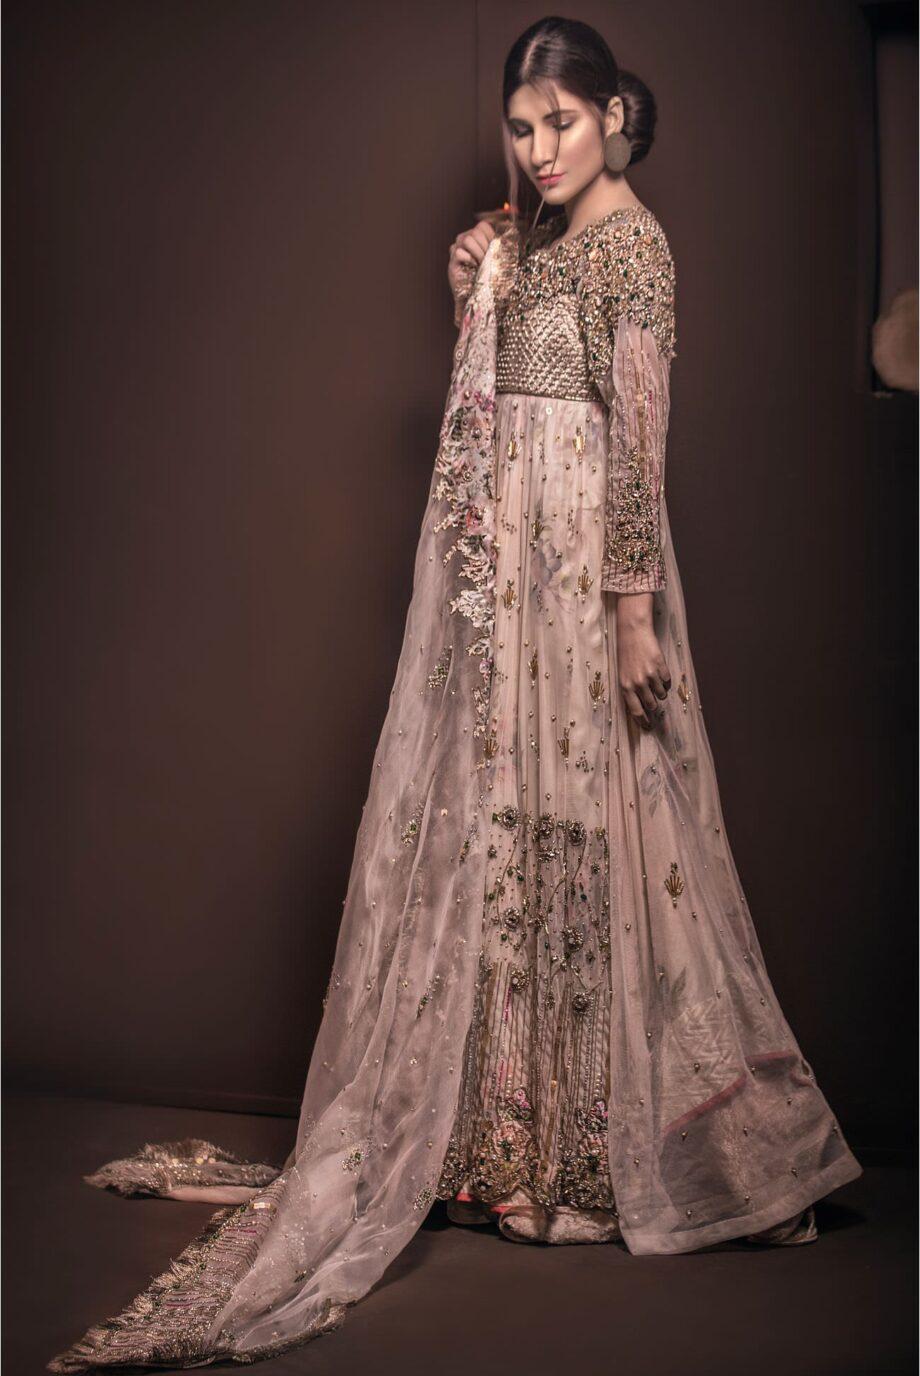 Buy Exclusive Light Pearl Peach Shadi And Valima Dress – Sabd208 Online In USA, Uk & Pakistan - 02